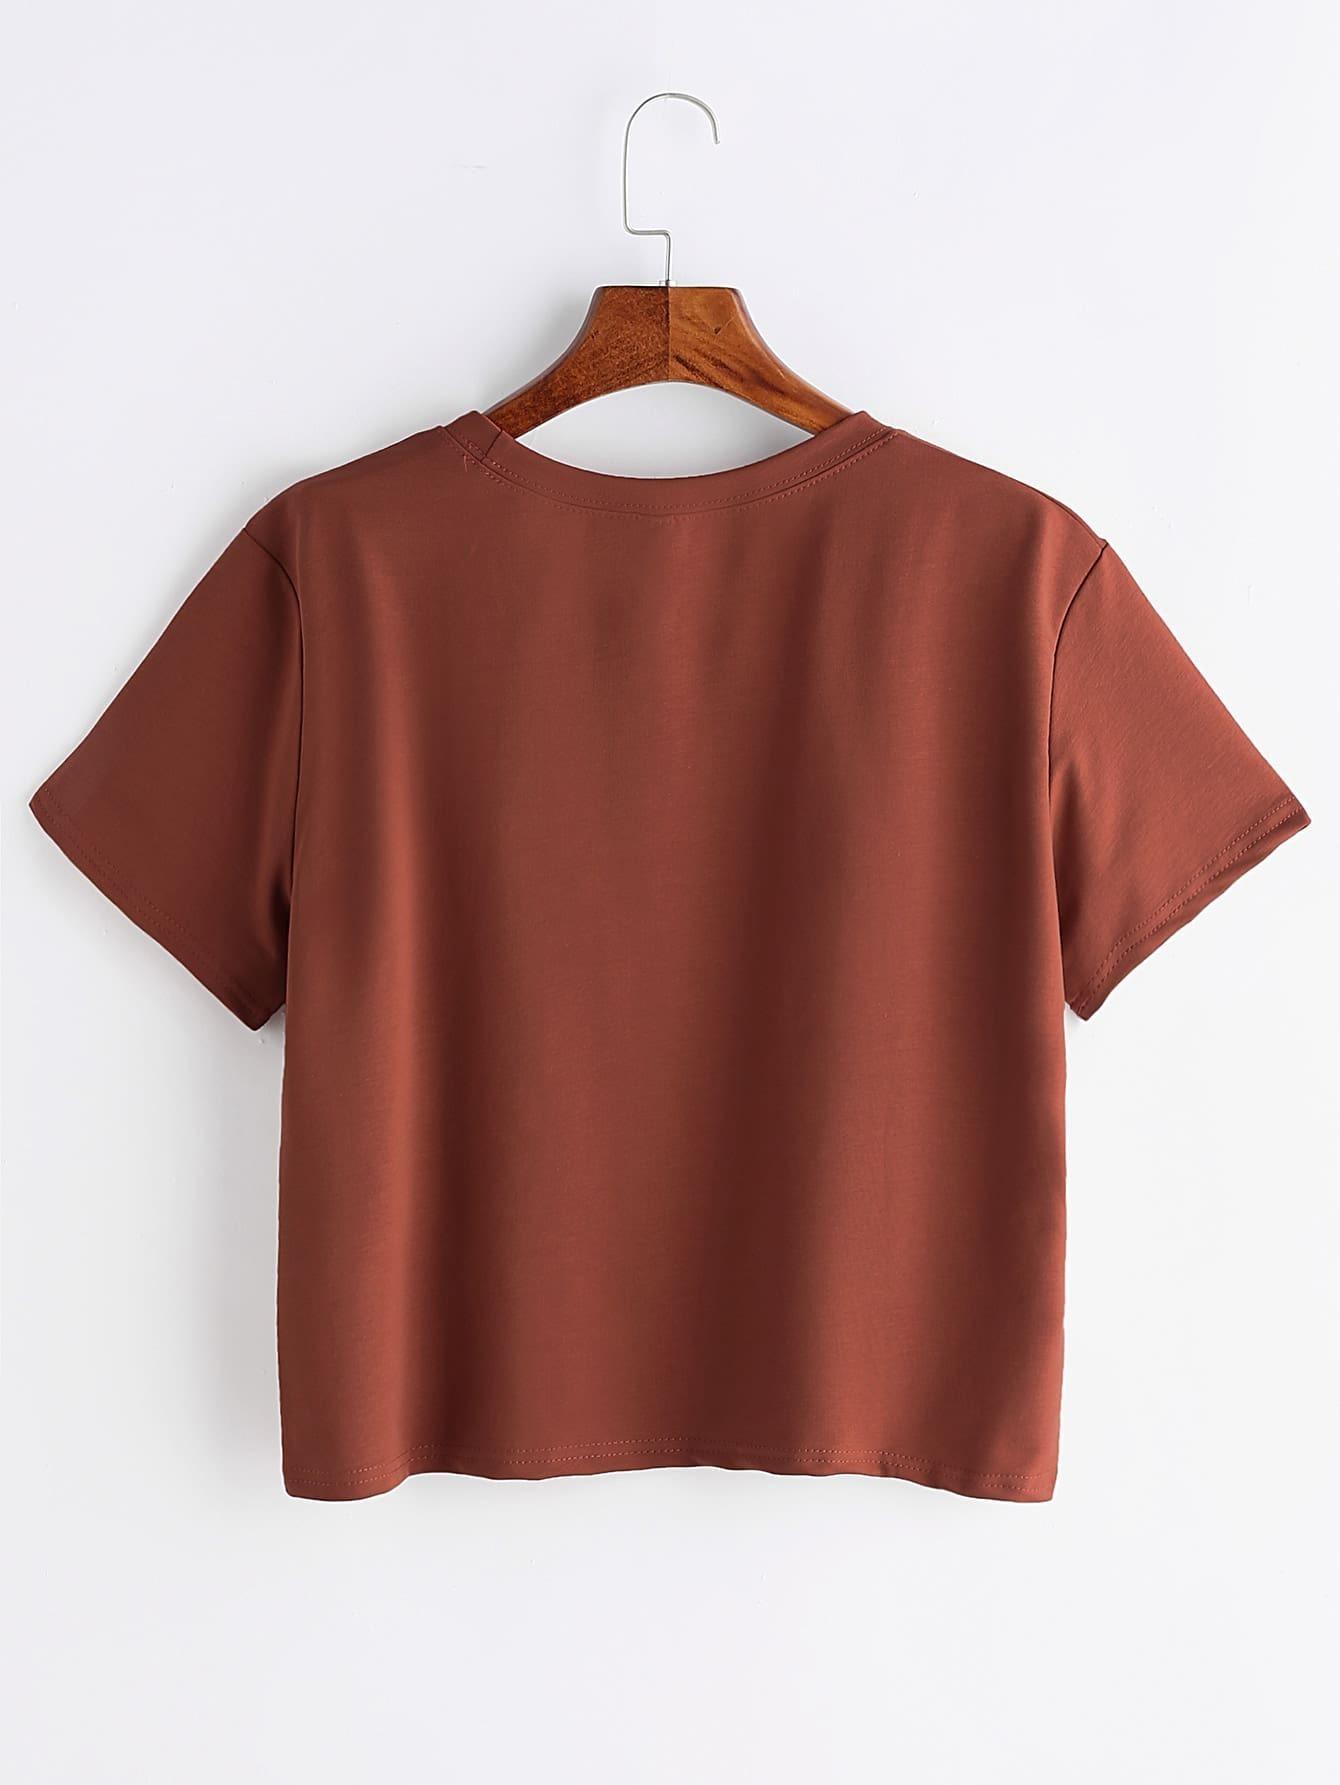 imprimer globe t shirt marron french romwe. Black Bedroom Furniture Sets. Home Design Ideas